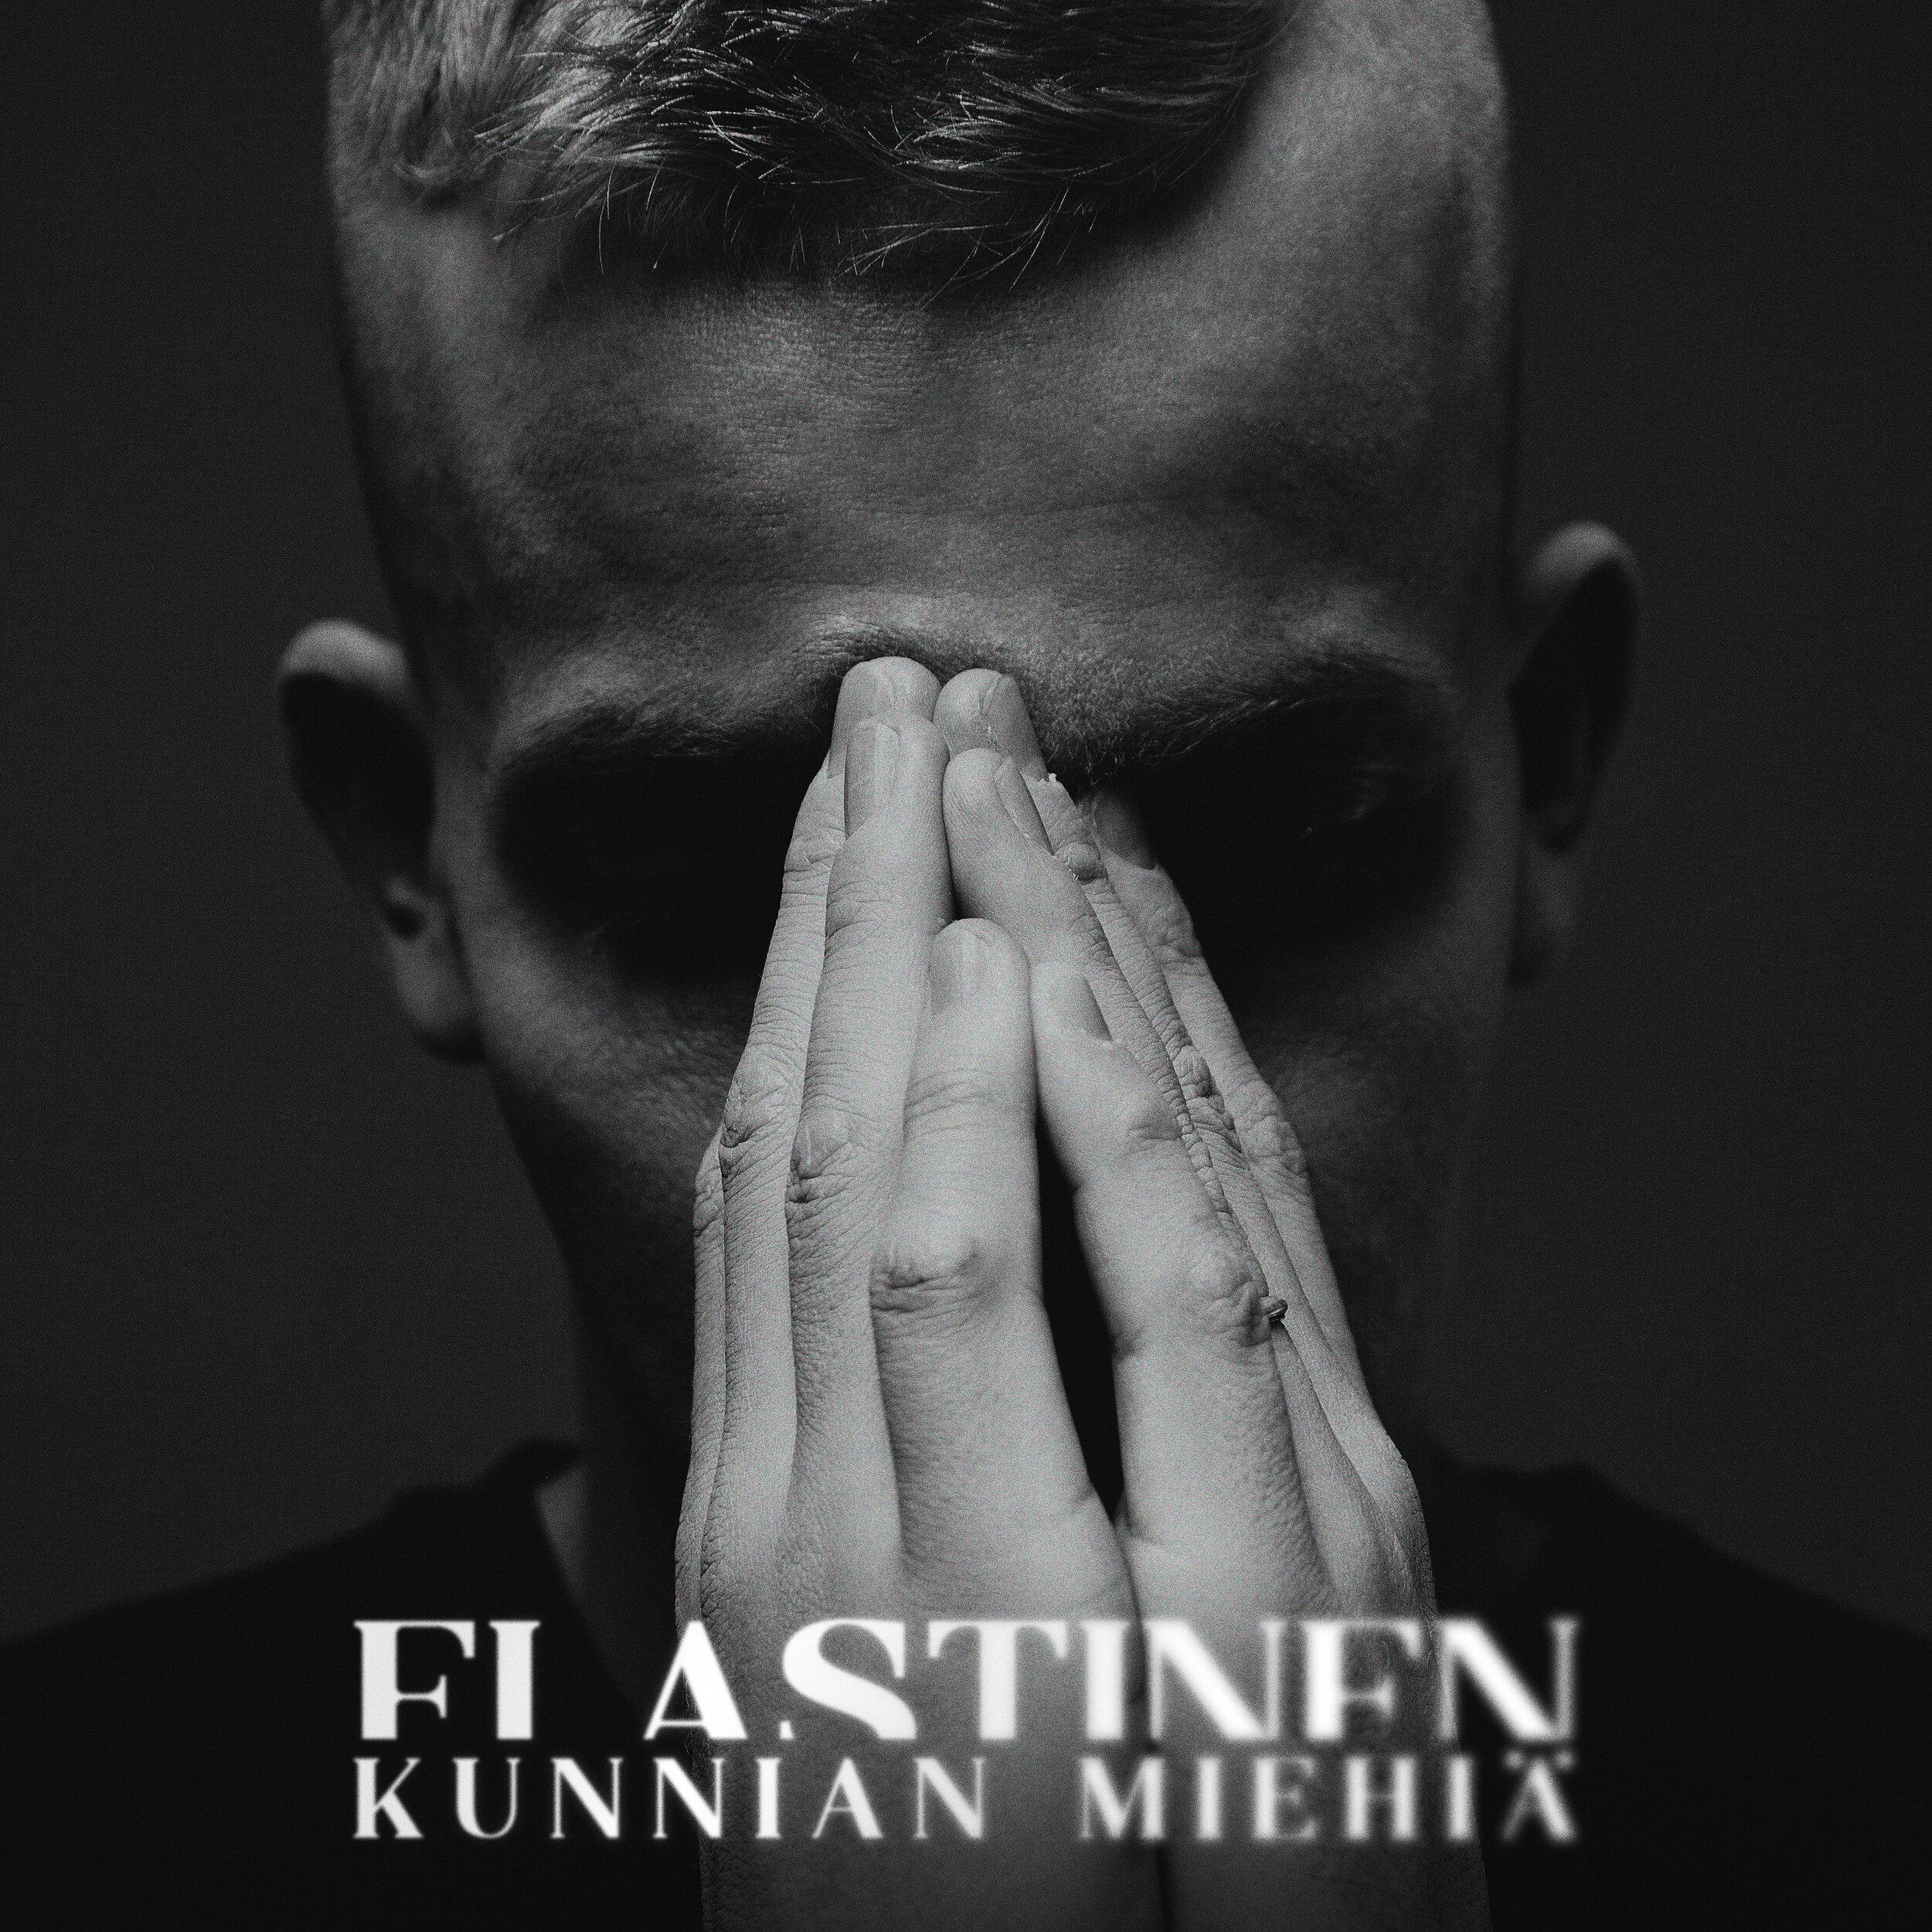 elastinen_kunnianmiehia_cover.jpg